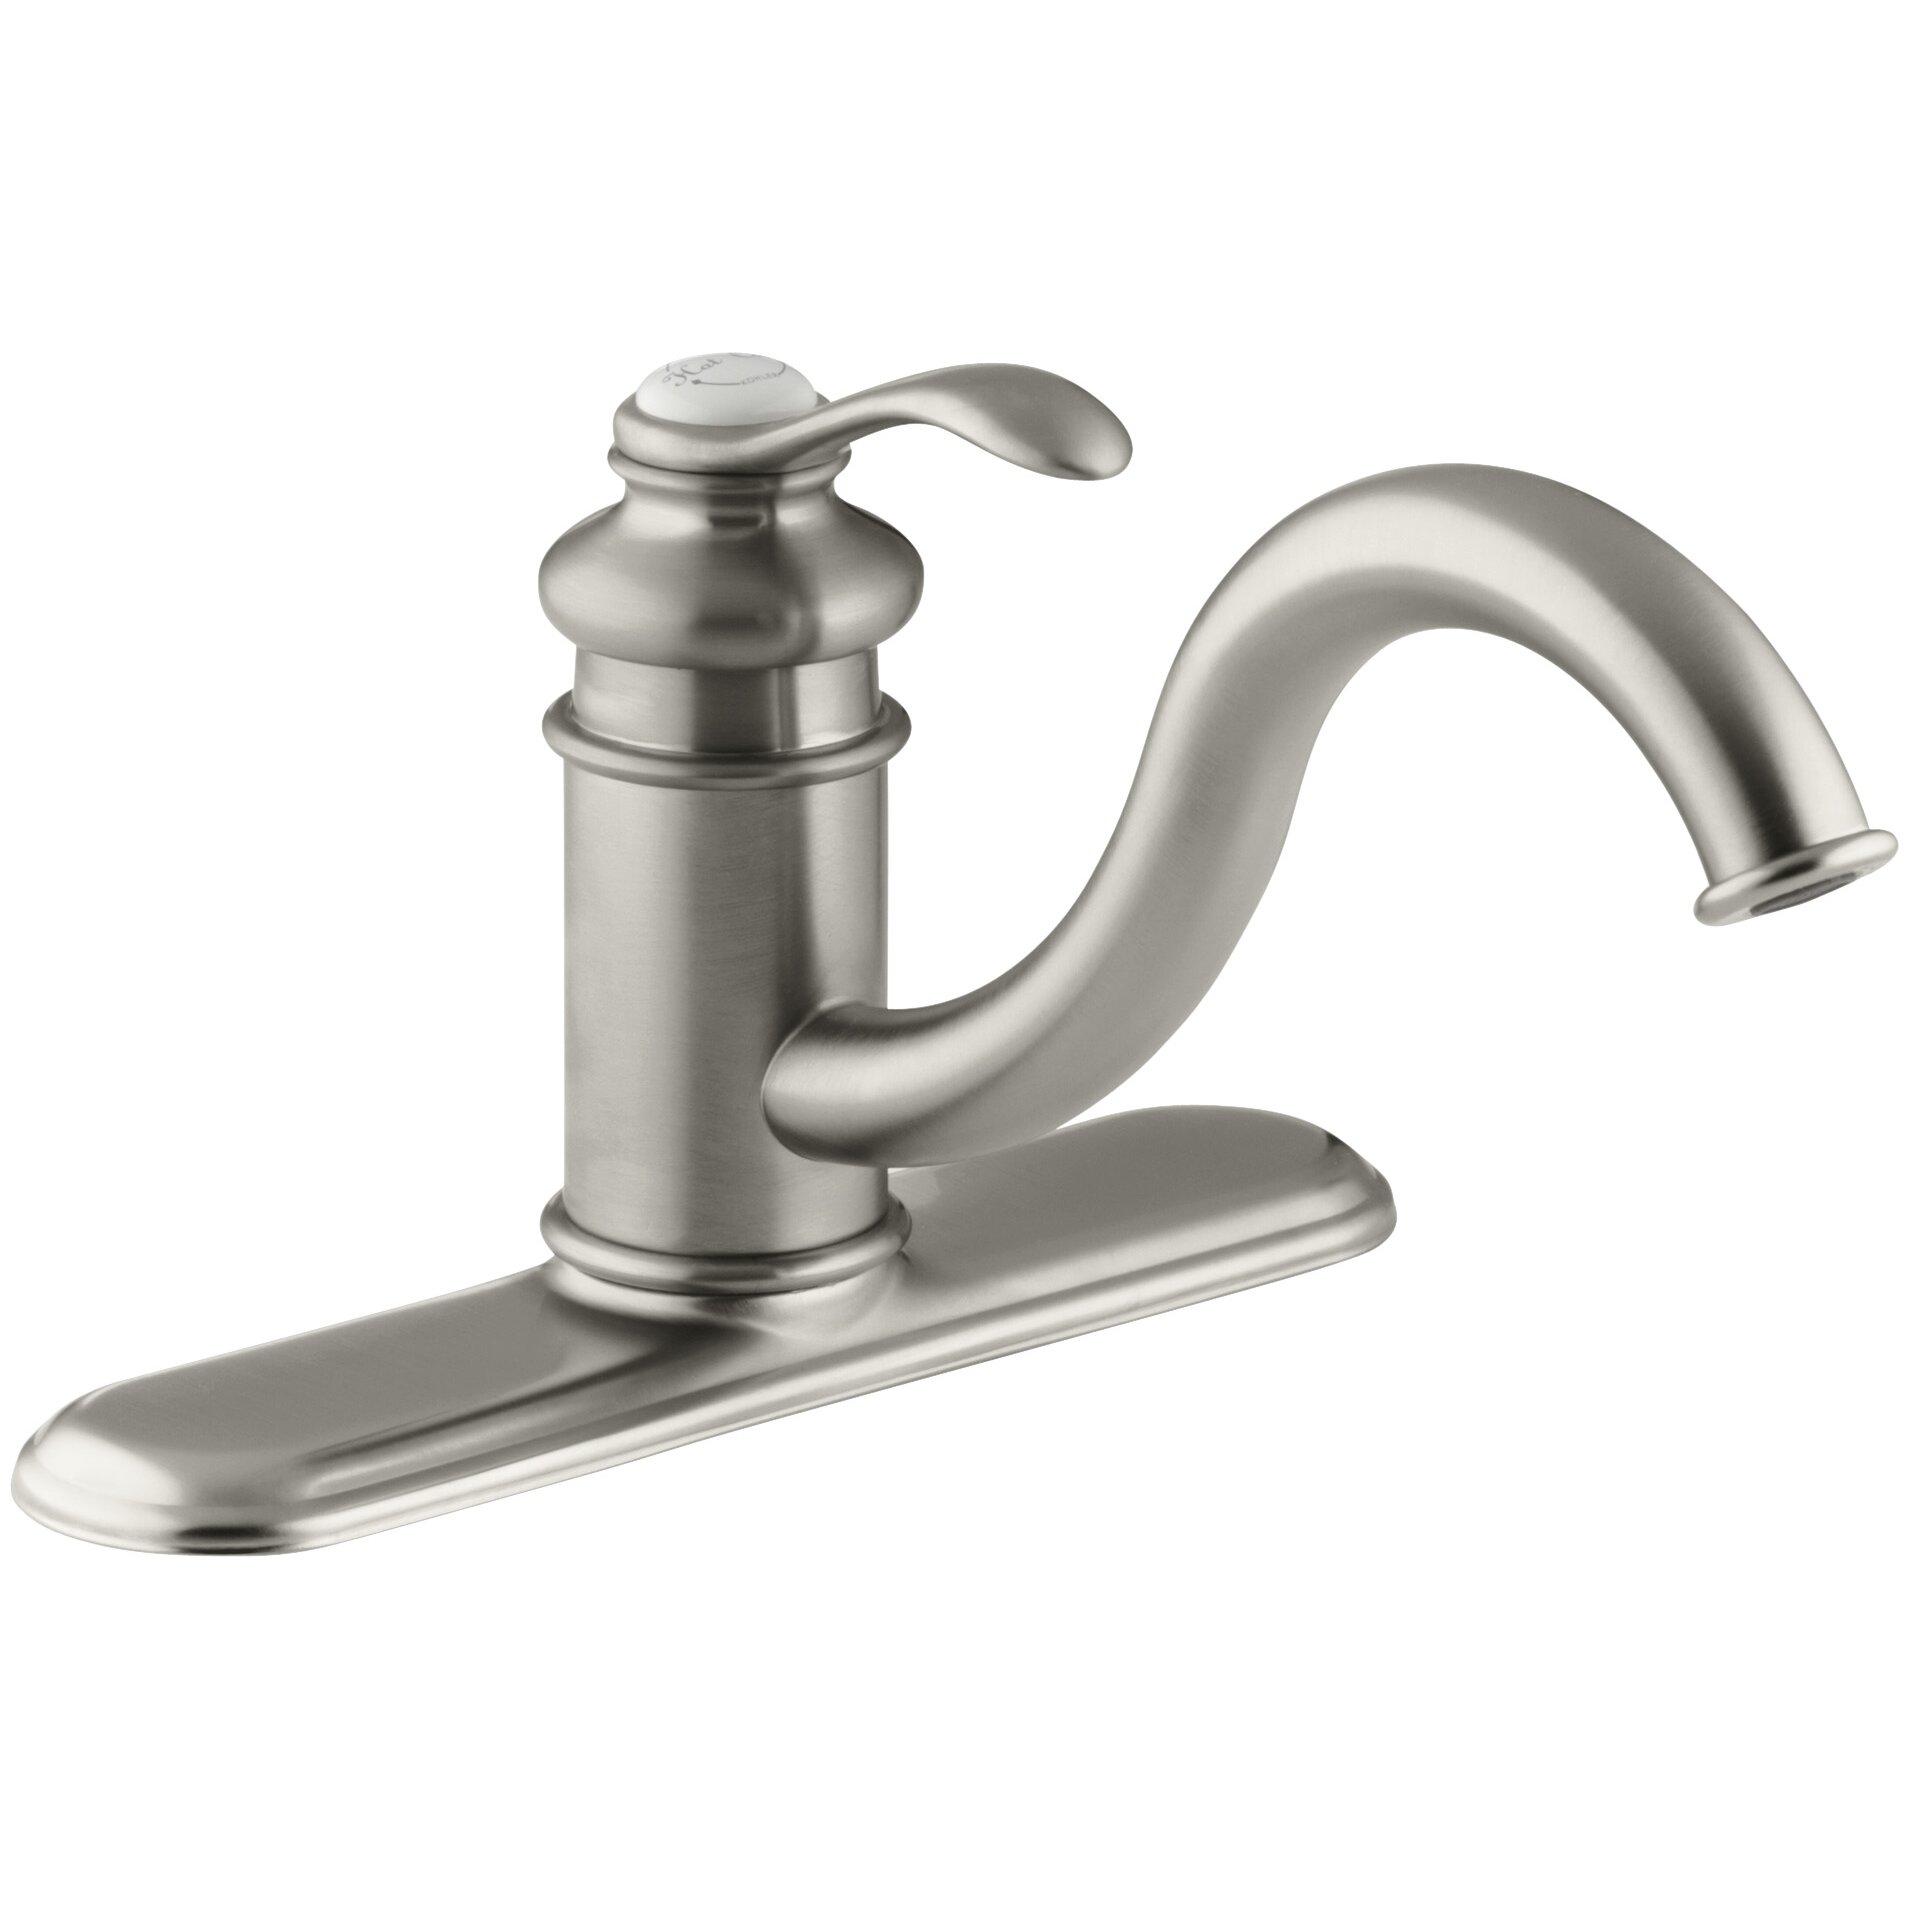 Kohler Fairfax Faucet : kohler k cp fairfax single handle kitchen faucet with matching side ...